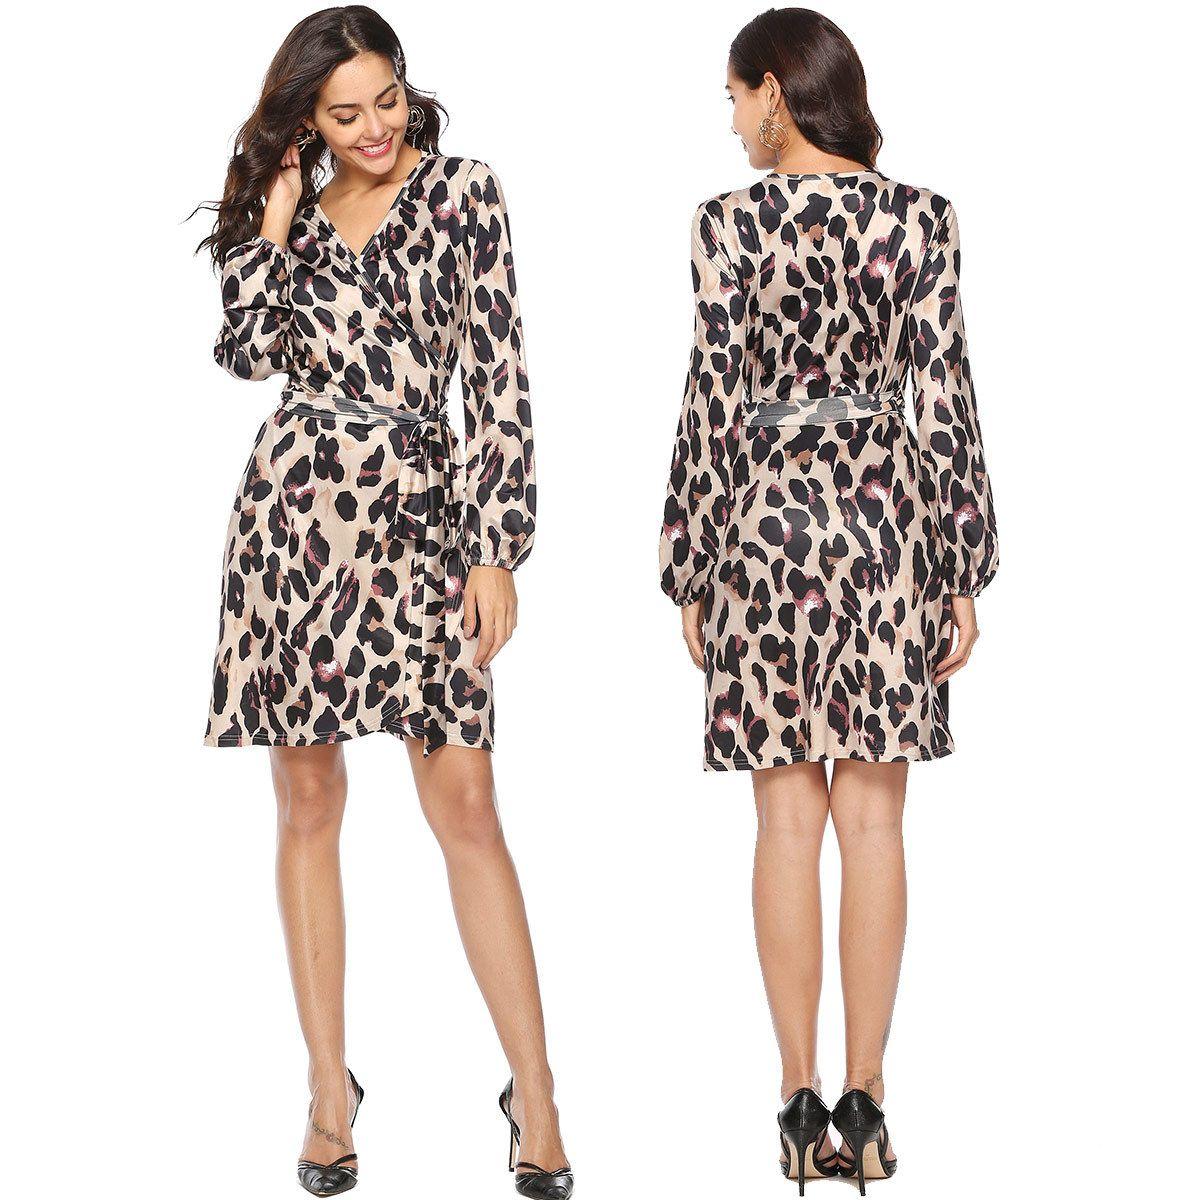 Women s Leopard Print Long Sleeve Deep V Neck Sexy Tie Front Wrap ... 6635a8a70e